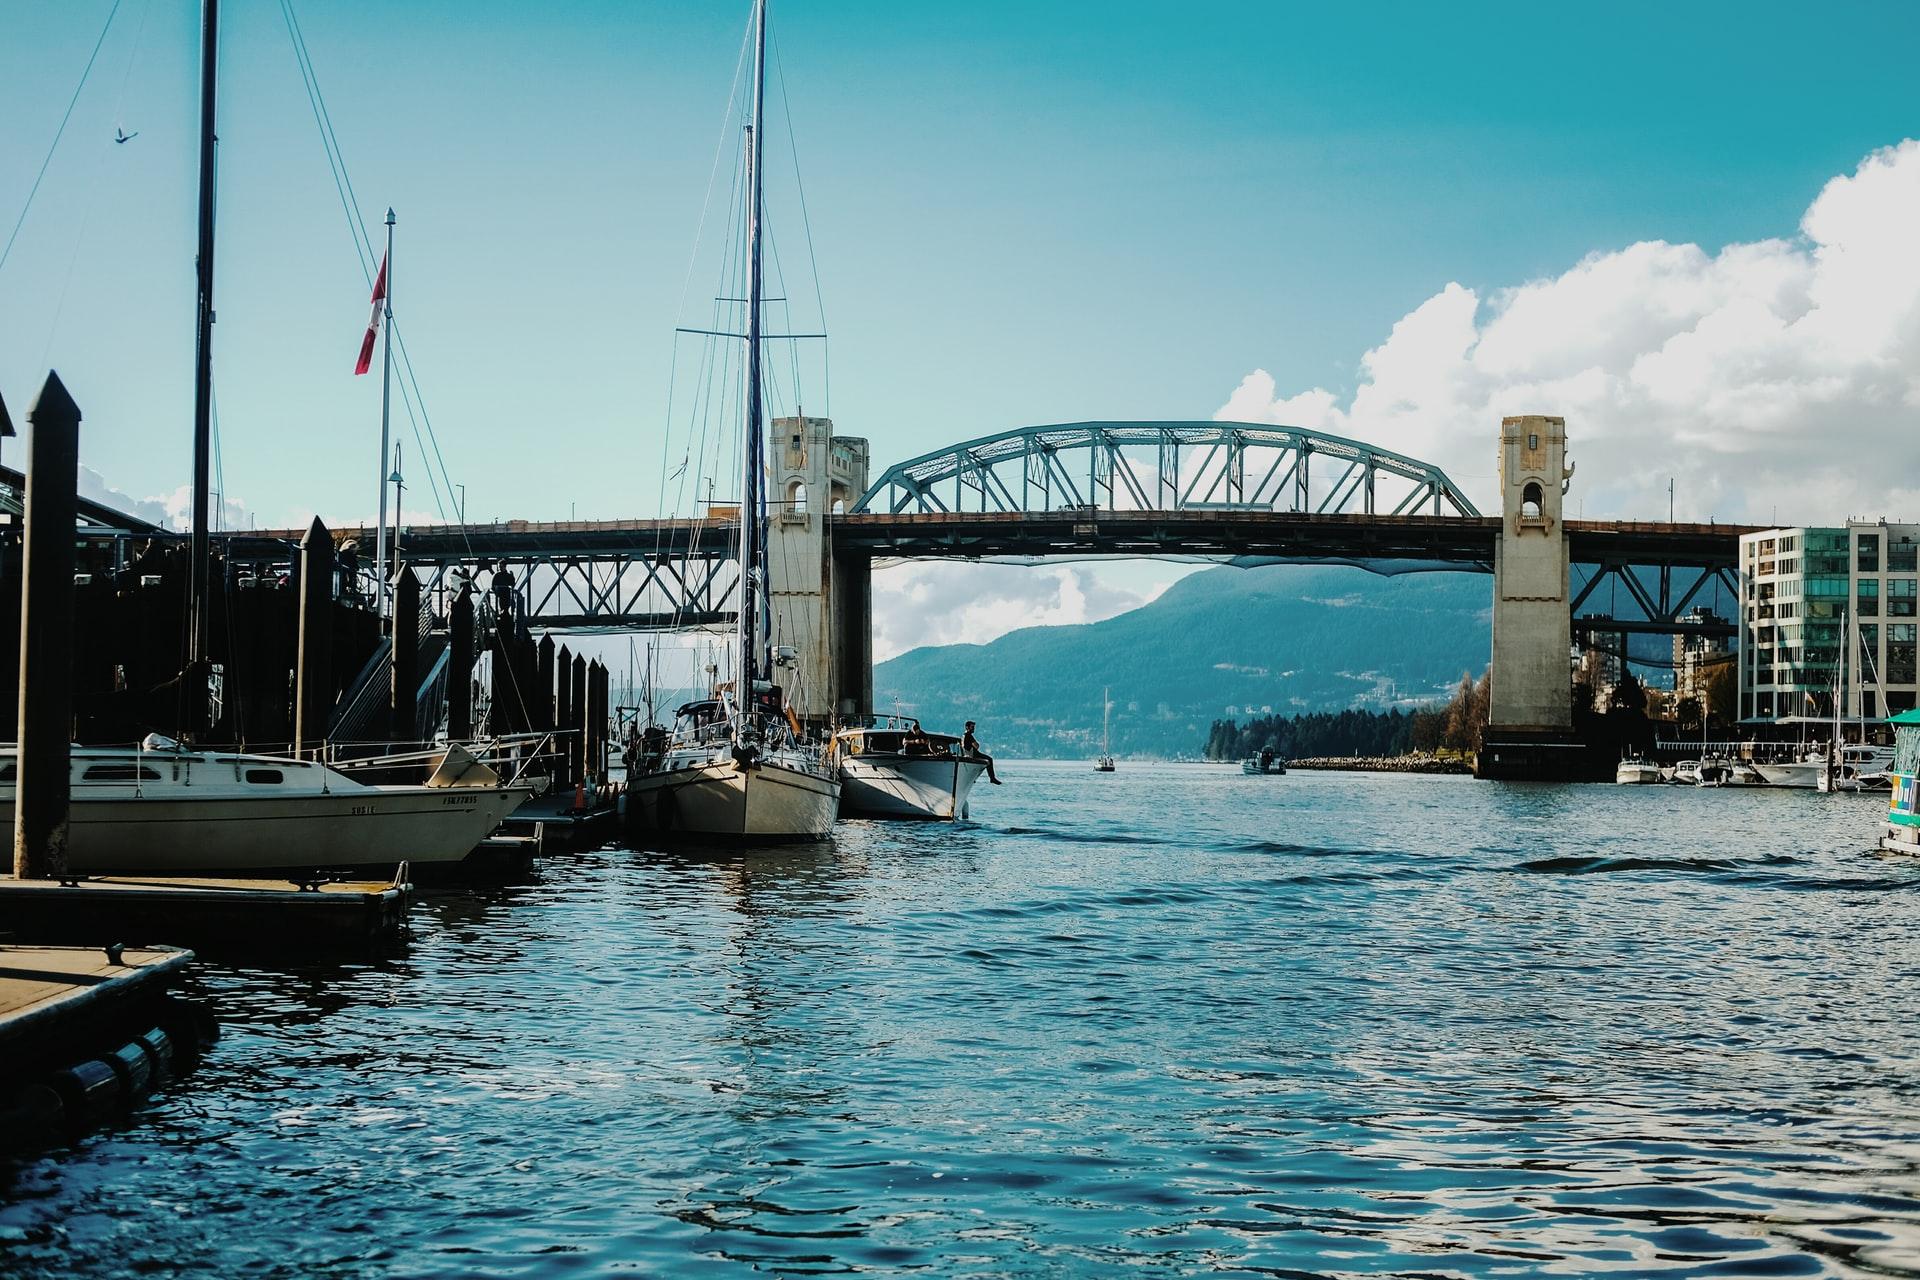 Granville Island bridge over water in Vancouver